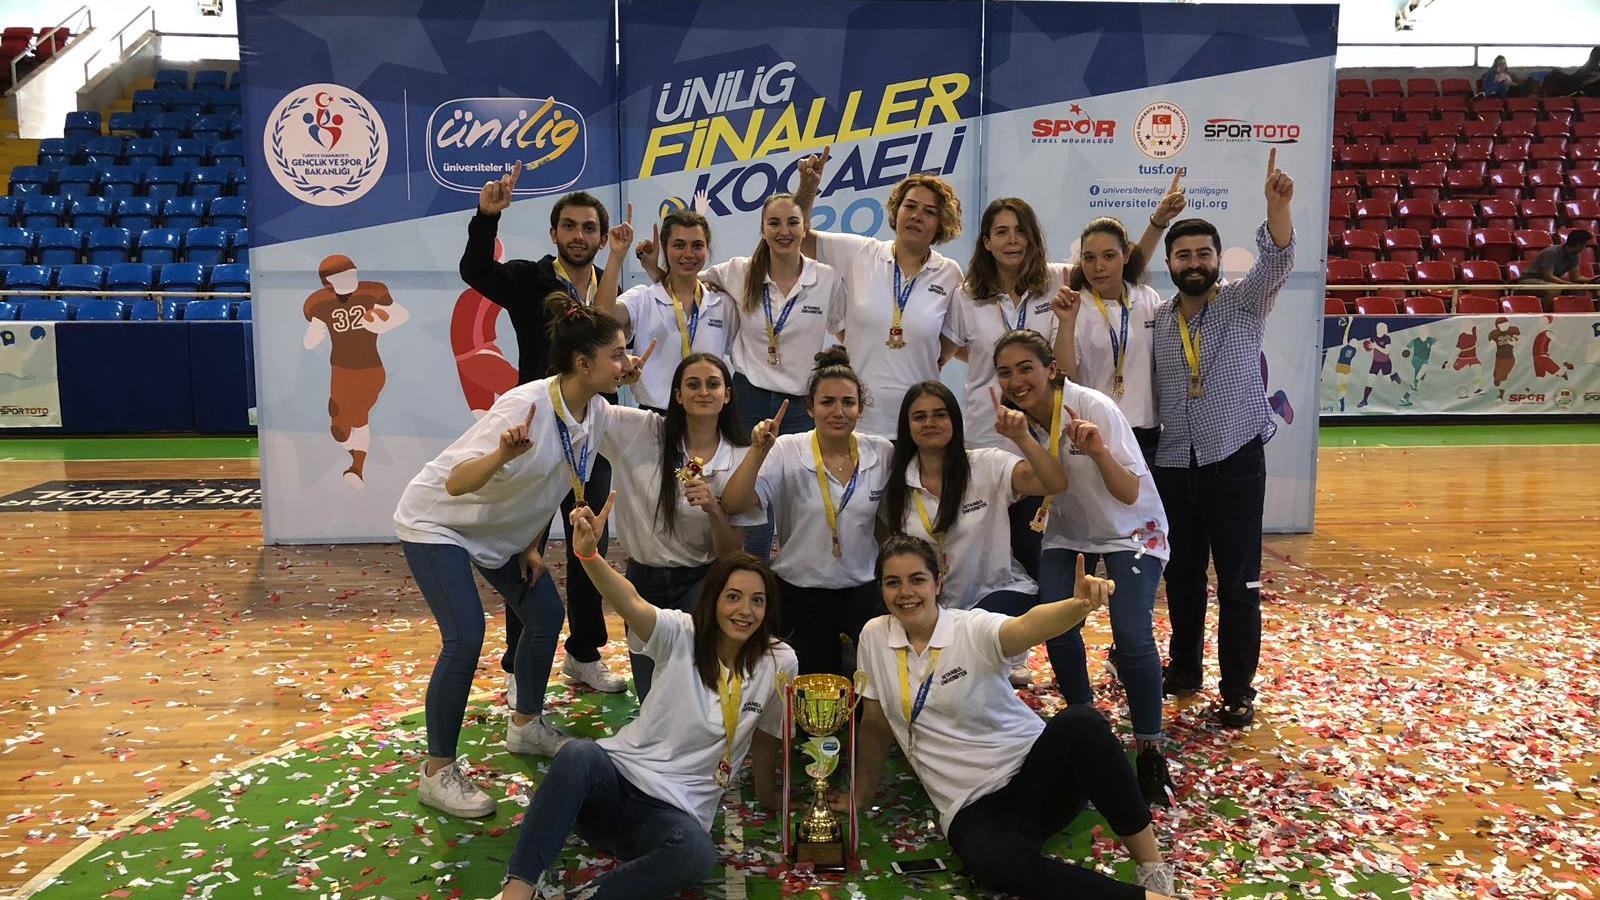 Istanbul-University-is-Ünilig's-2017-2018-Season-Champion